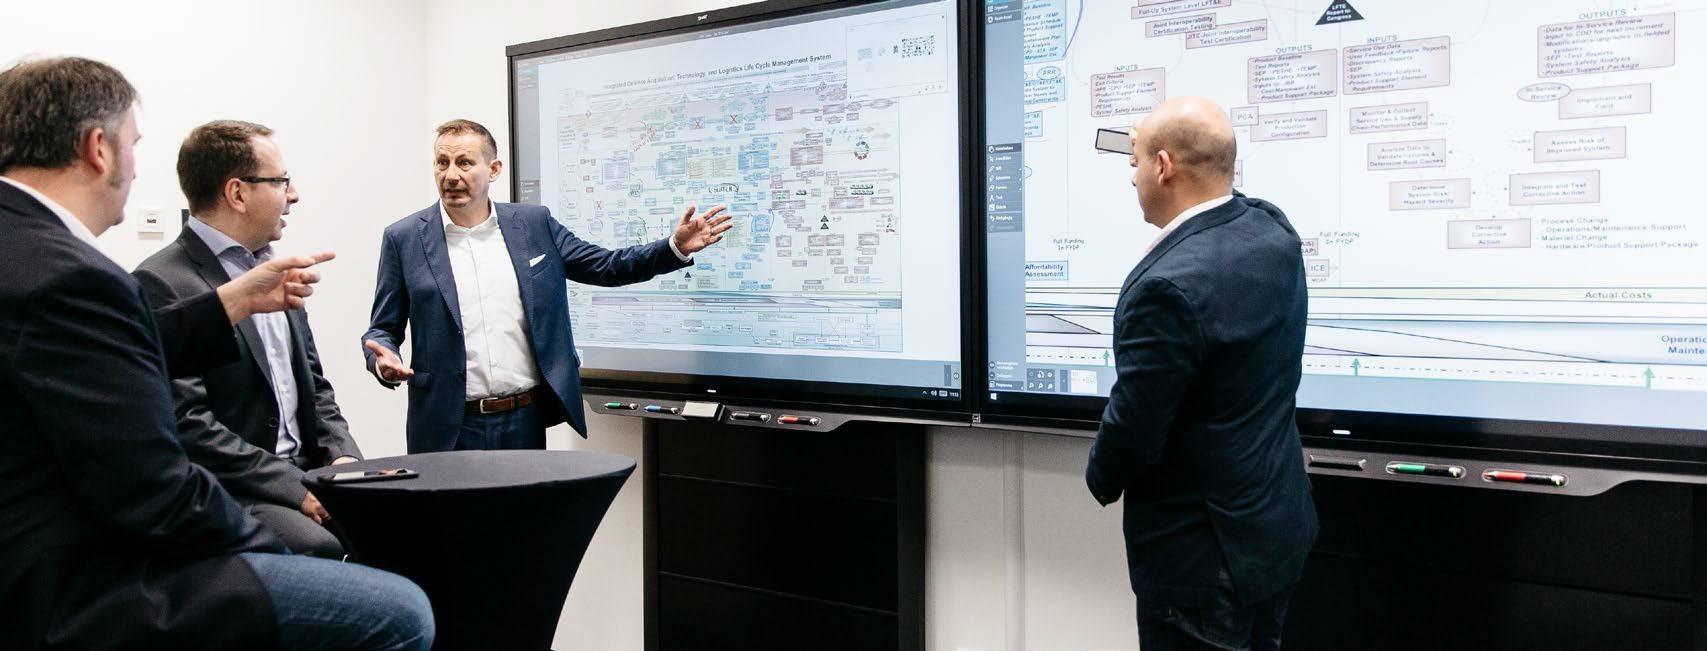 interaktivni softver SMART Meeting Pro